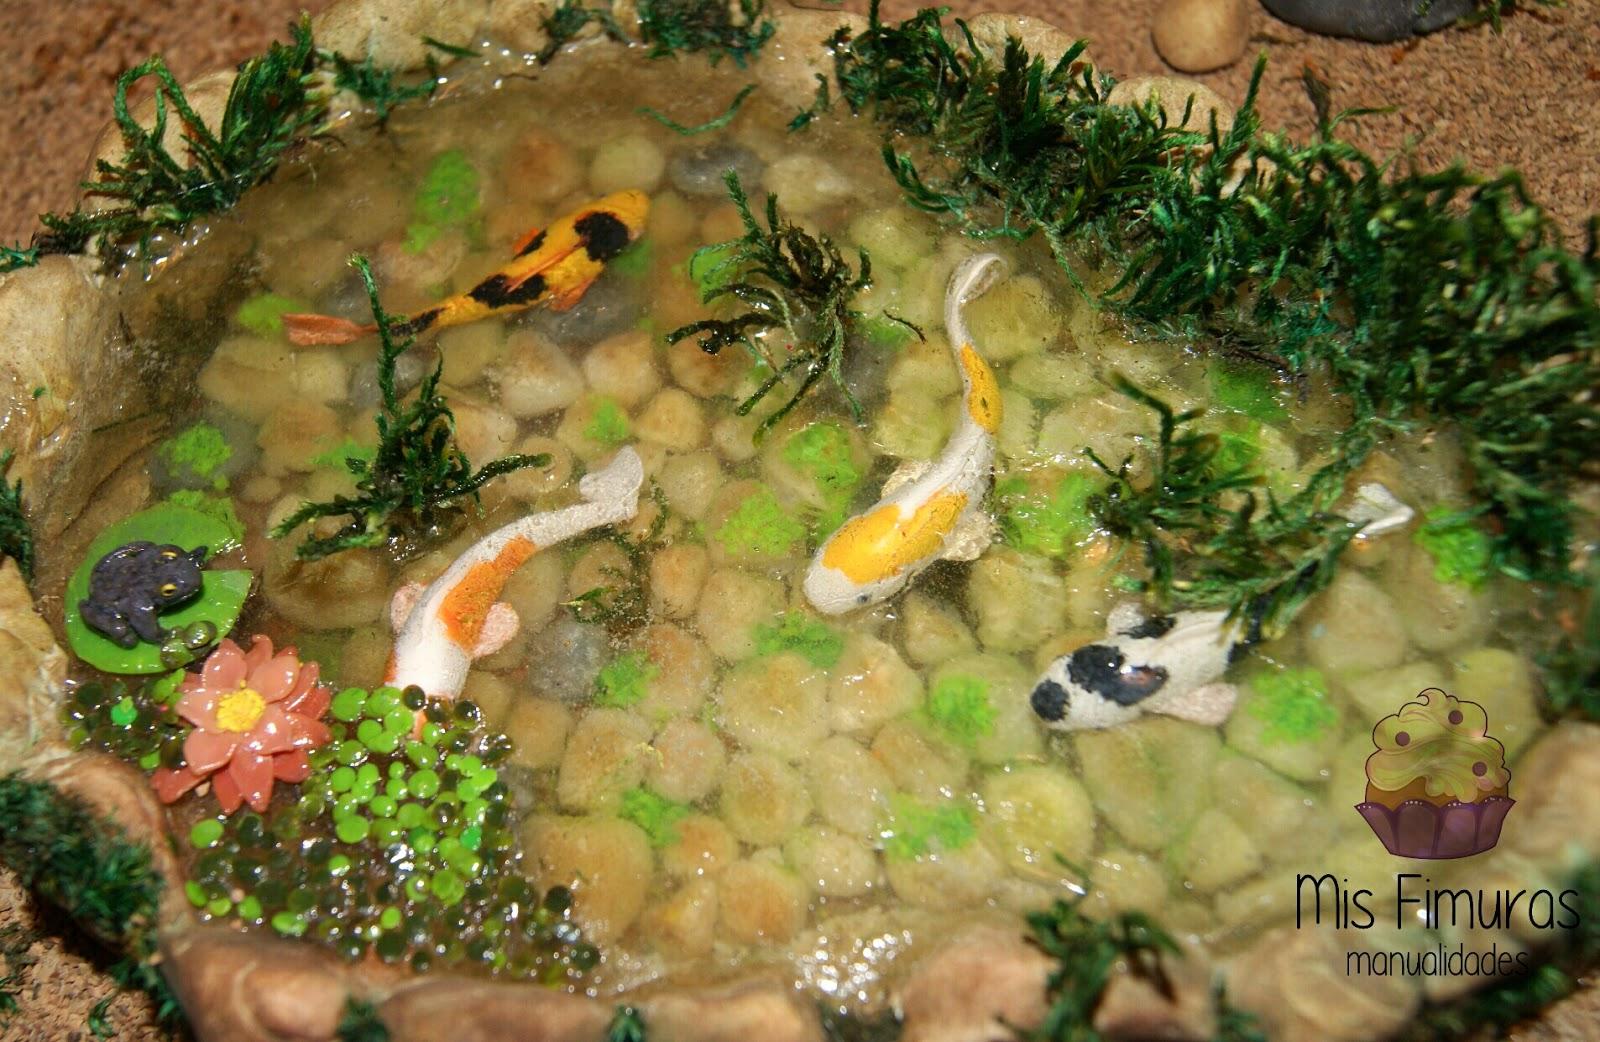 Mis fimuras estanque carpas koi for Imagenes de estanques para ninos